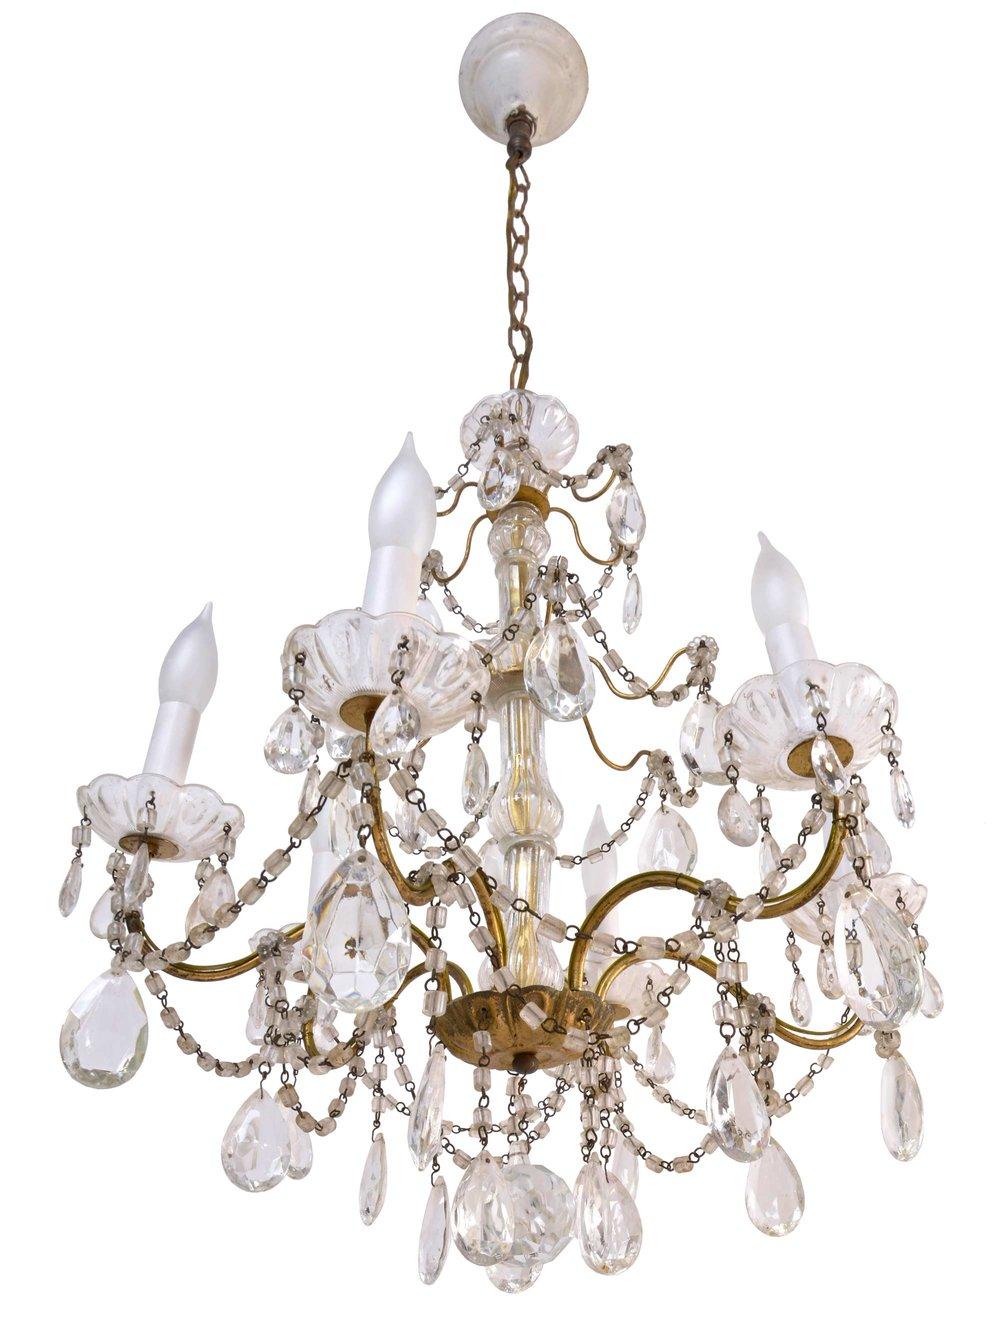 46610-six-arm-small-bead-chandelier-angle.jpg